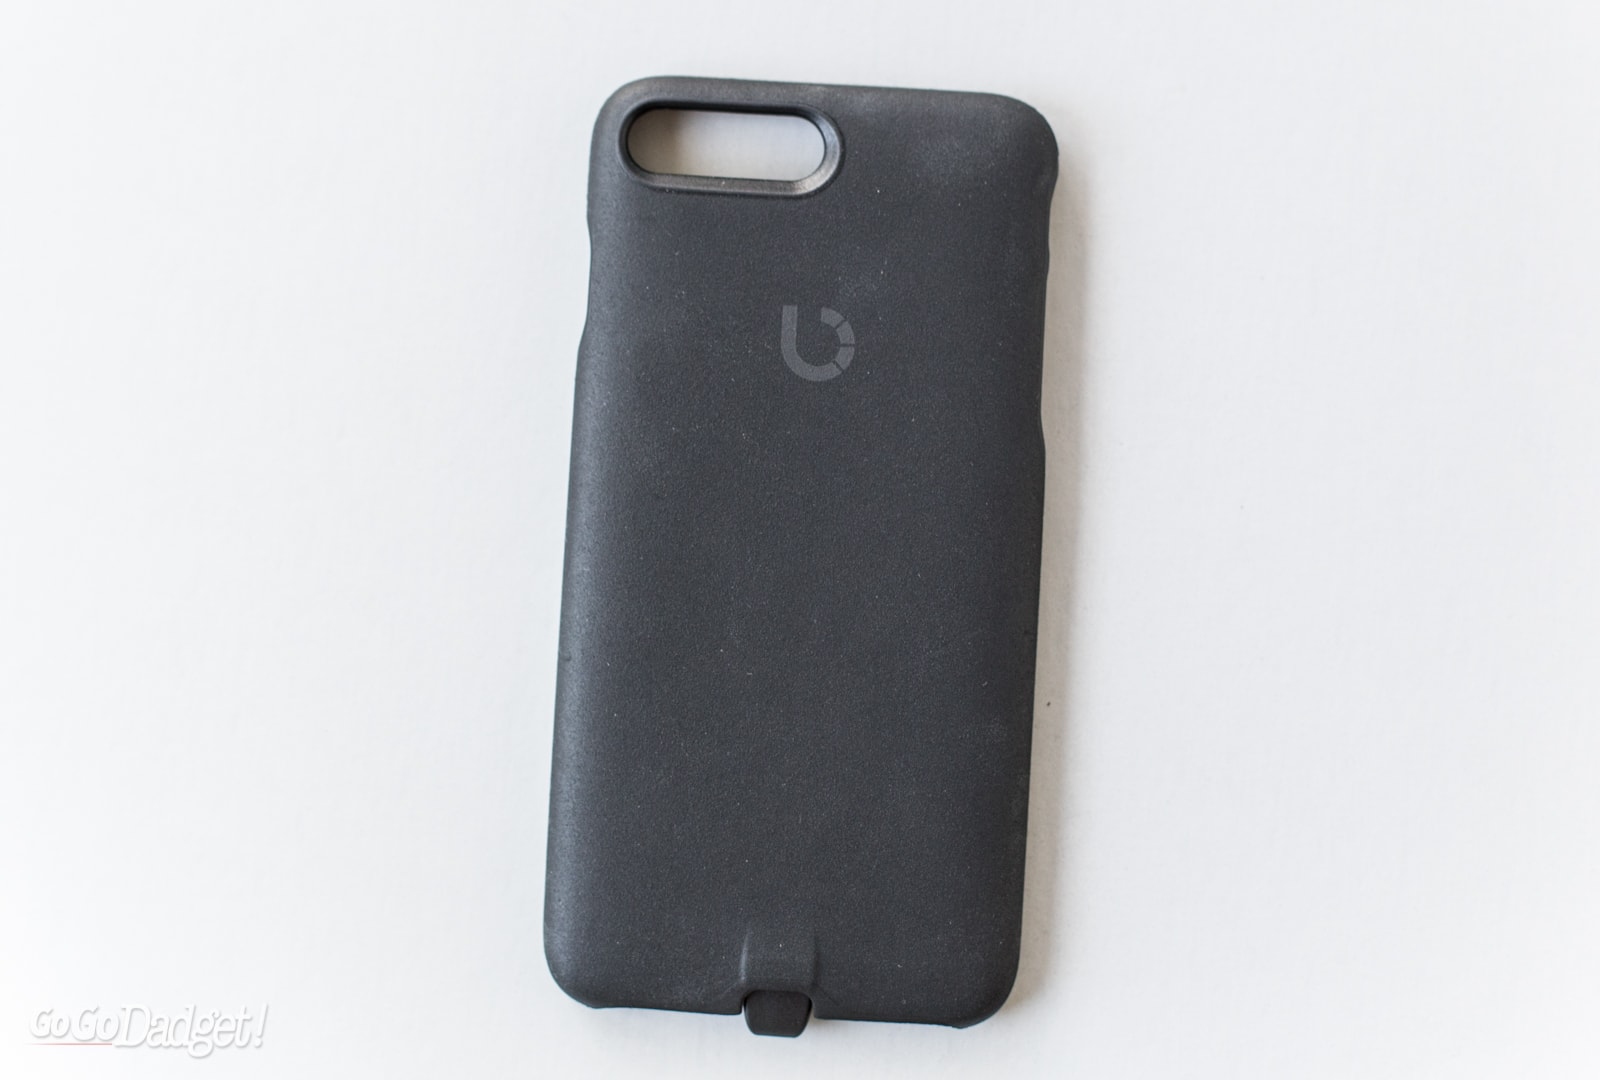 buy popular 18171 da4ac Bezalel iPhone 7 Plus Latitude Wireless Charging Case Review